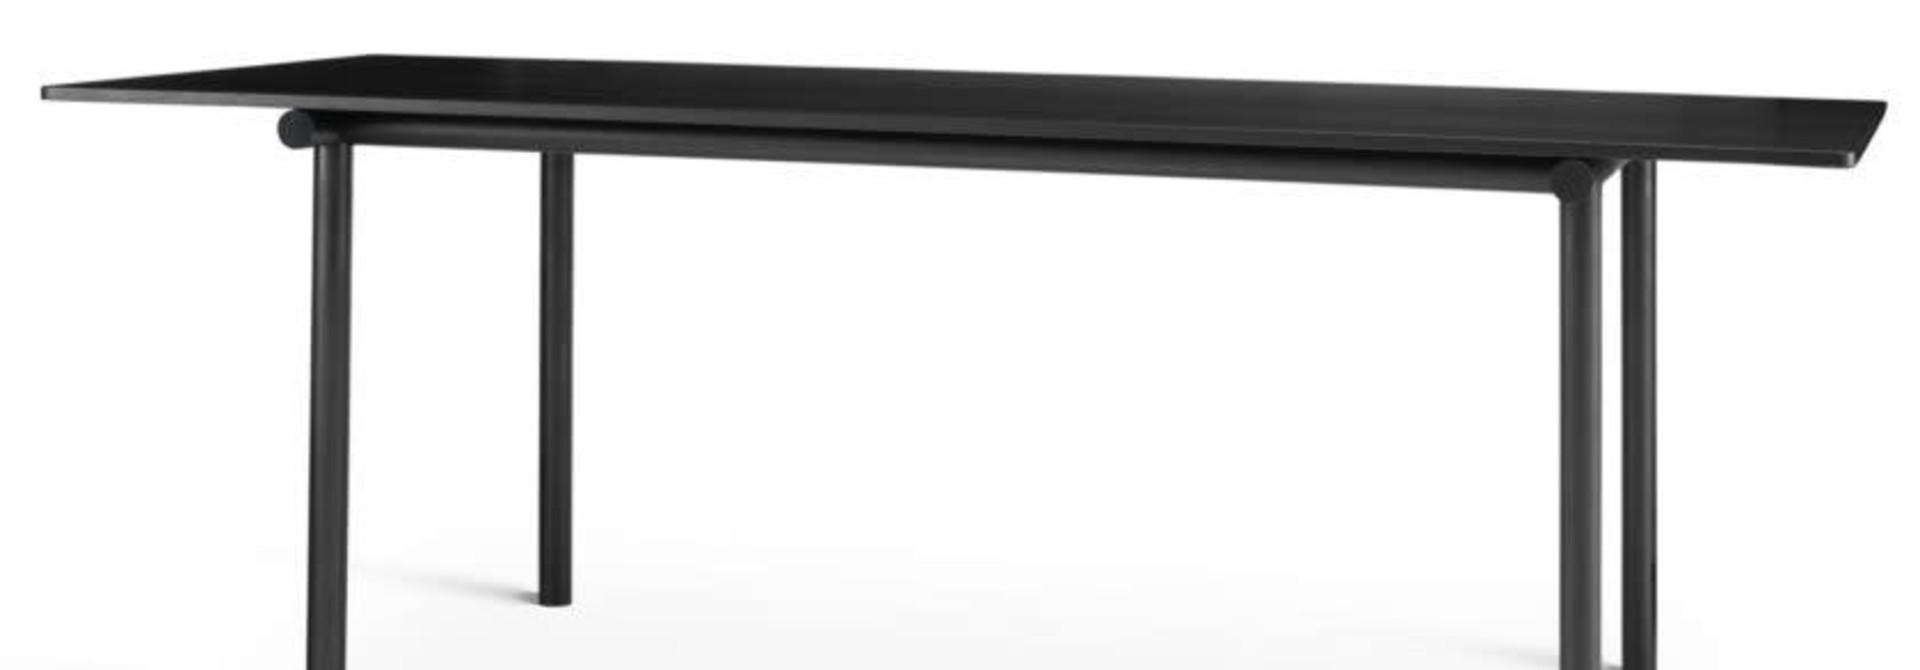 Tubby Tube Table - Black Frame 200 x 90 cm.